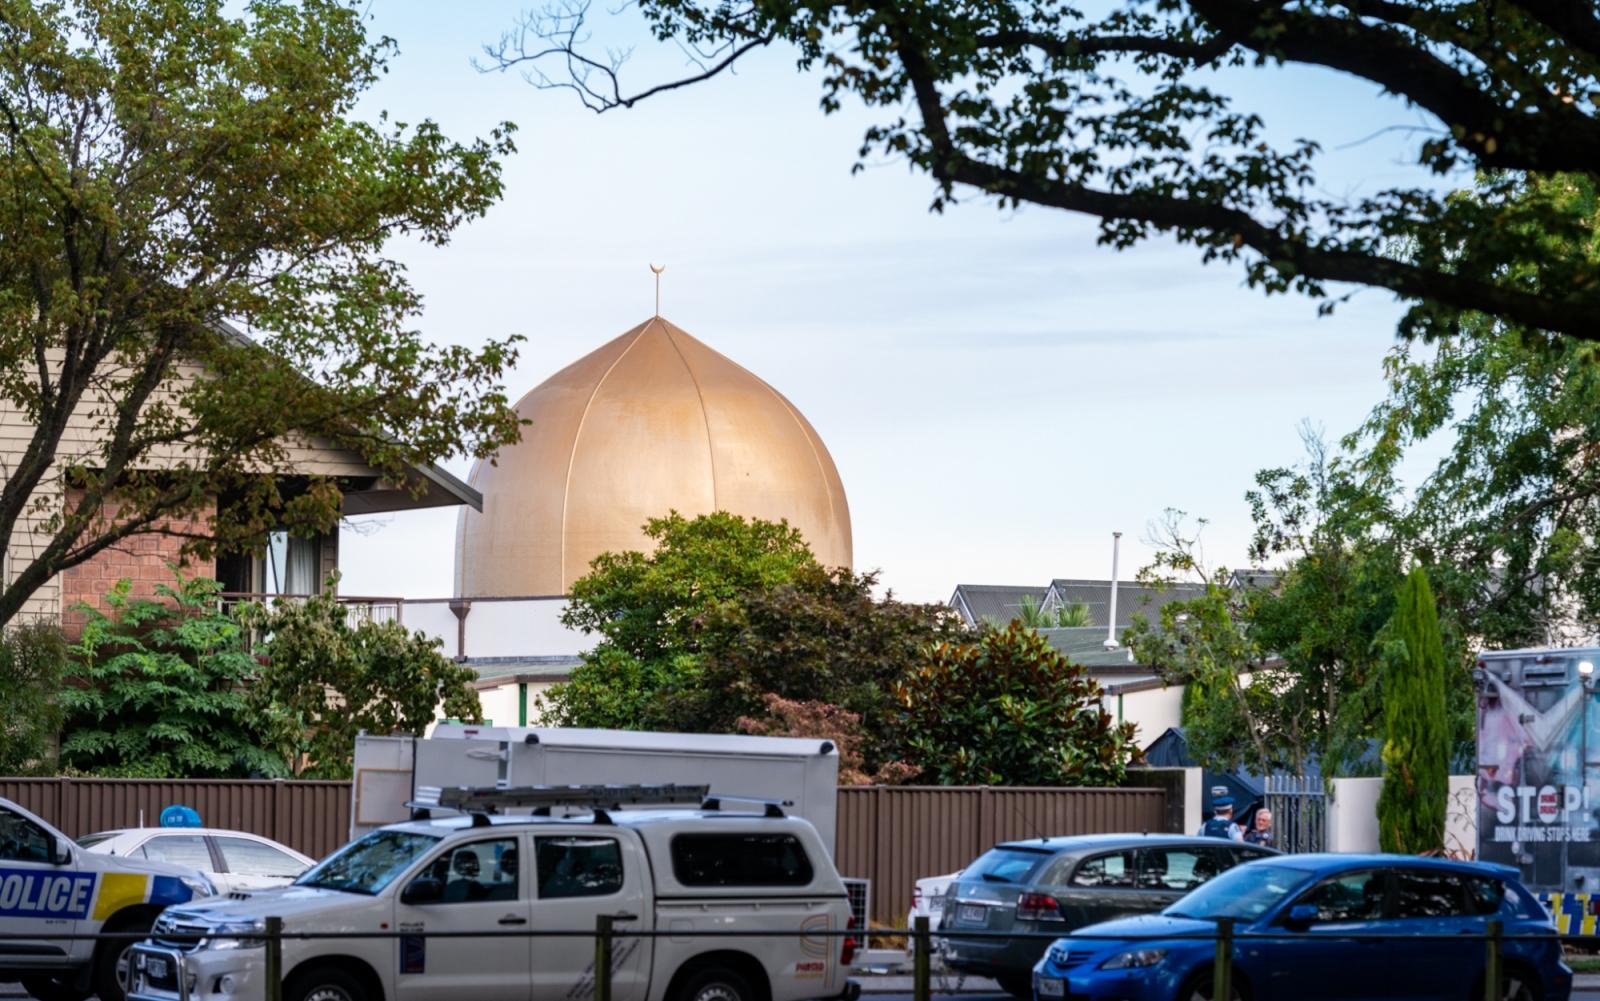 New gun laws will make New Zealand safer after mosque